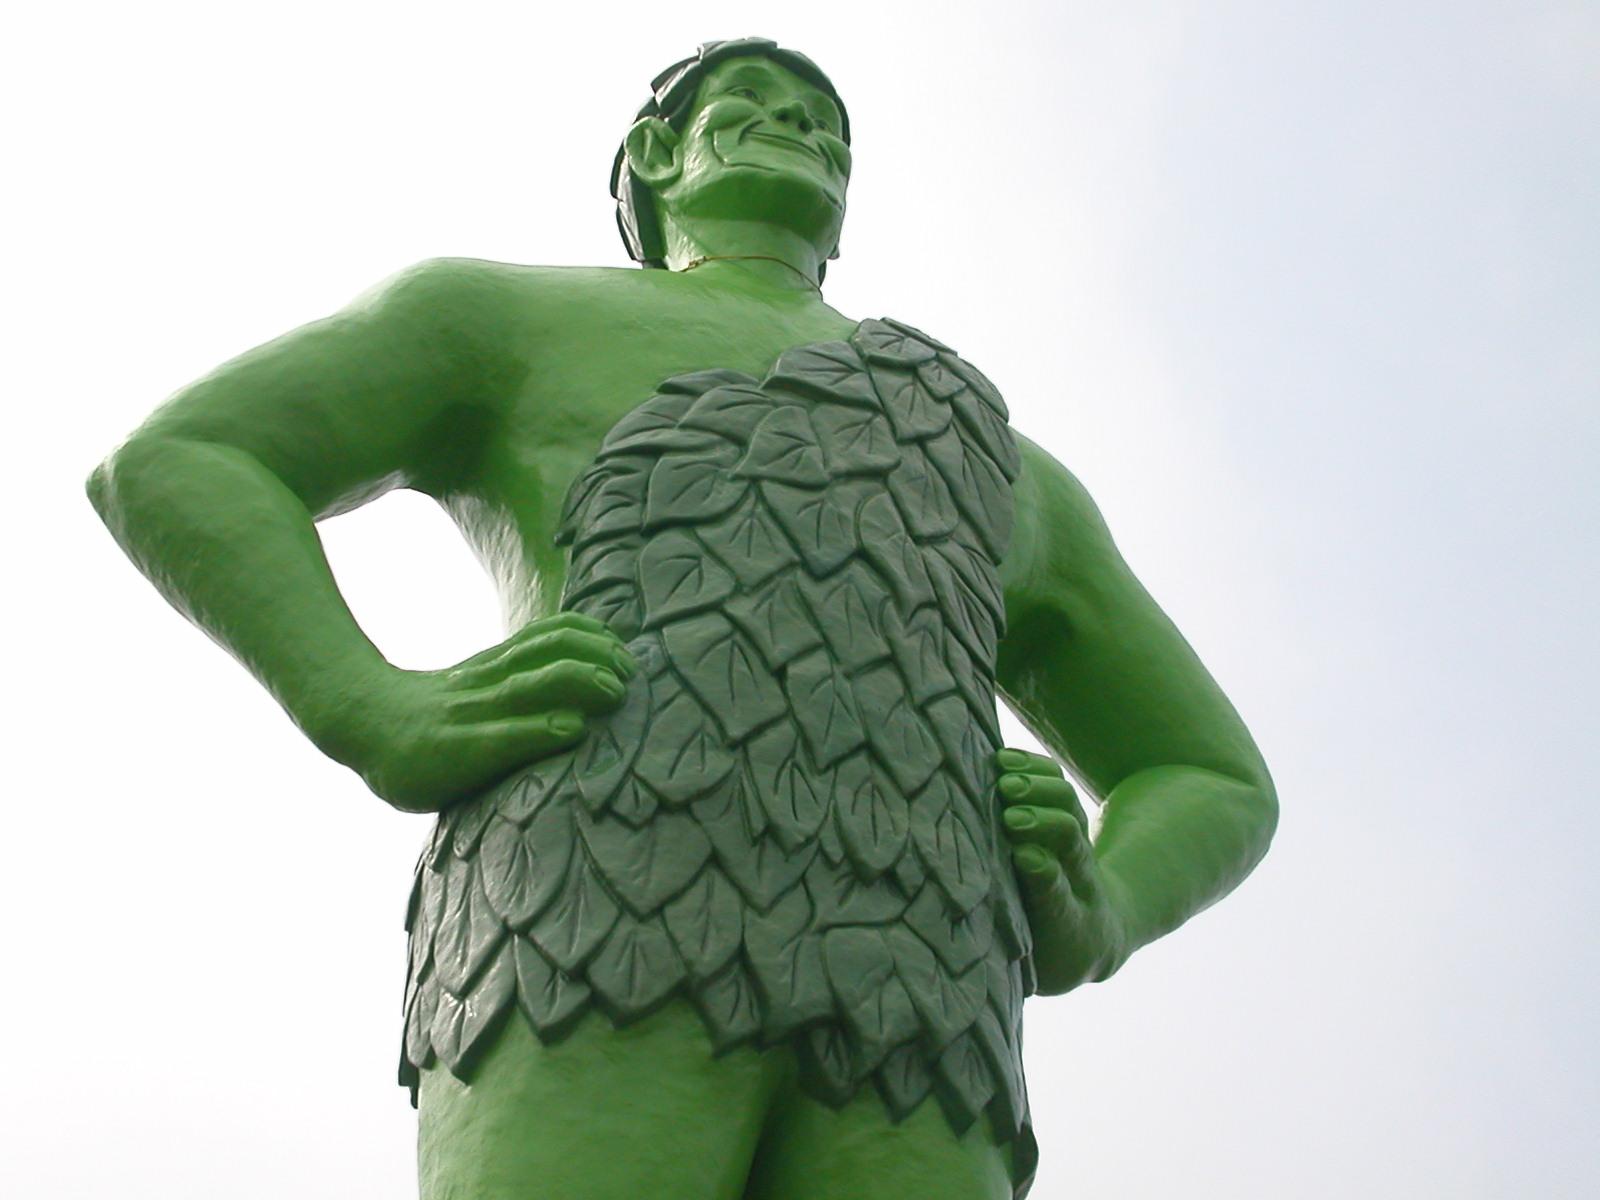 A green giant wearing a leaf one shoulder shirt